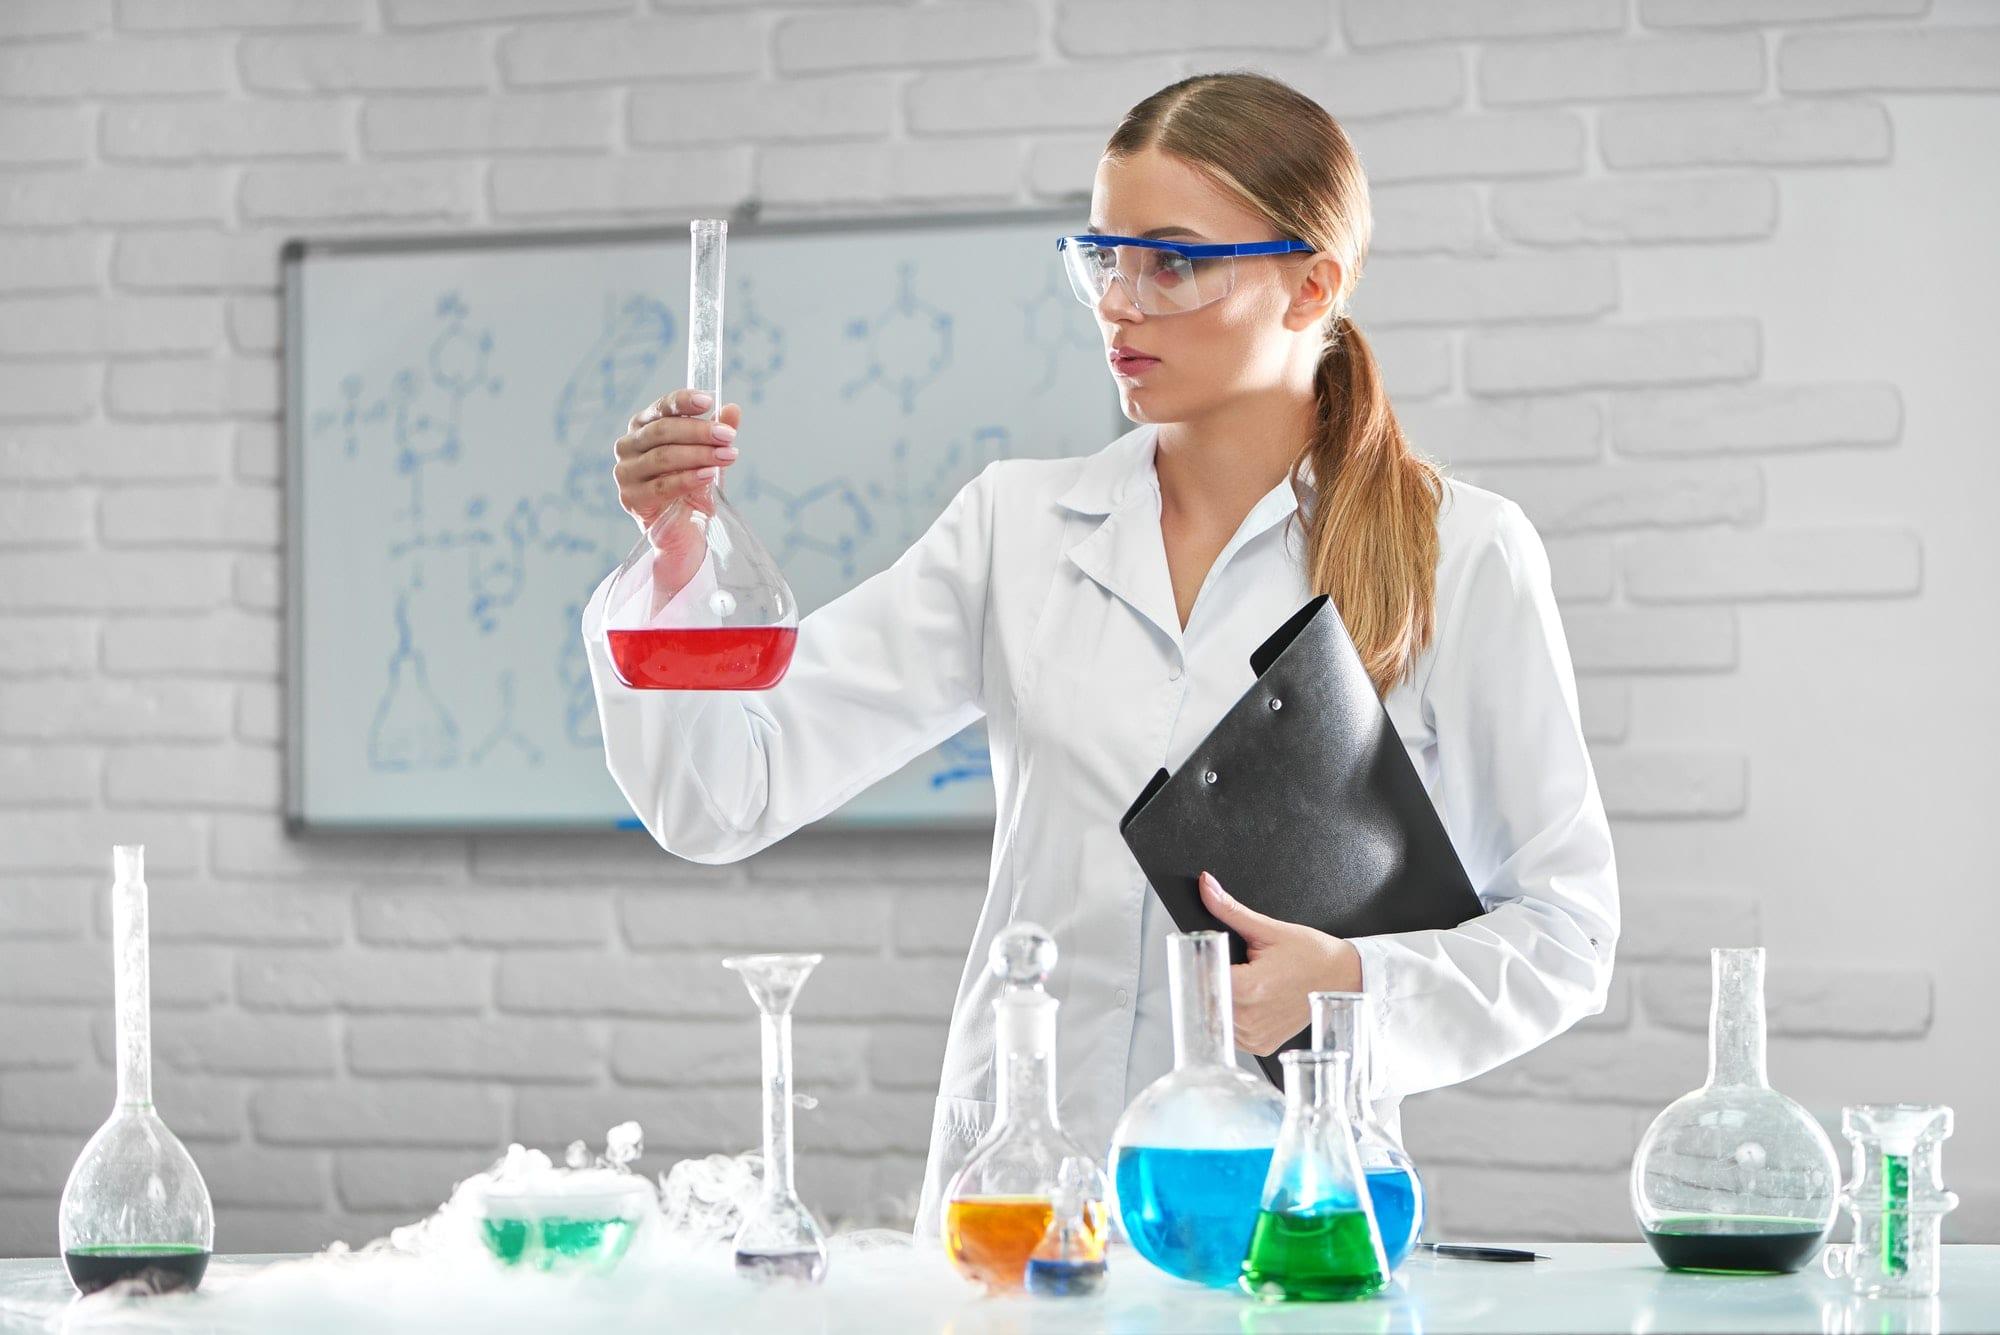 Female chemist working at the laboratory